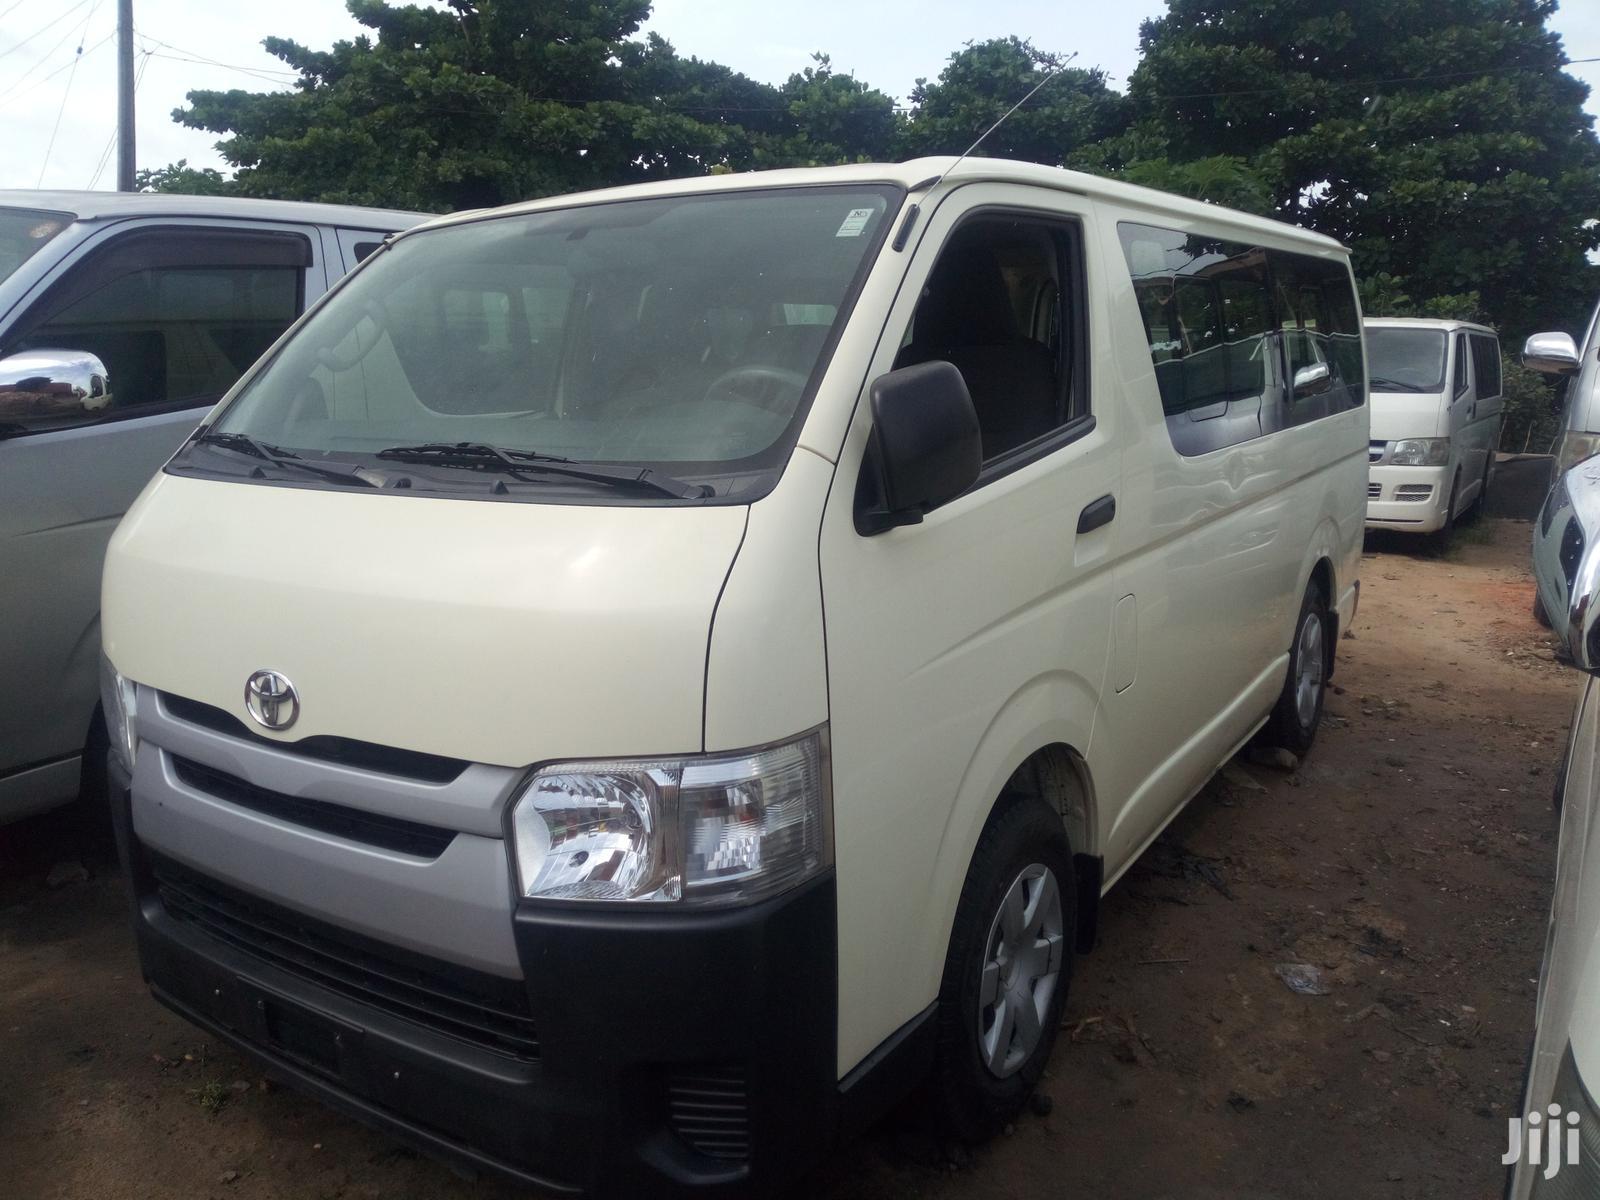 Toyota HiAce 2016 White | Buses & Microbuses for sale in Apapa, Lagos State, Nigeria